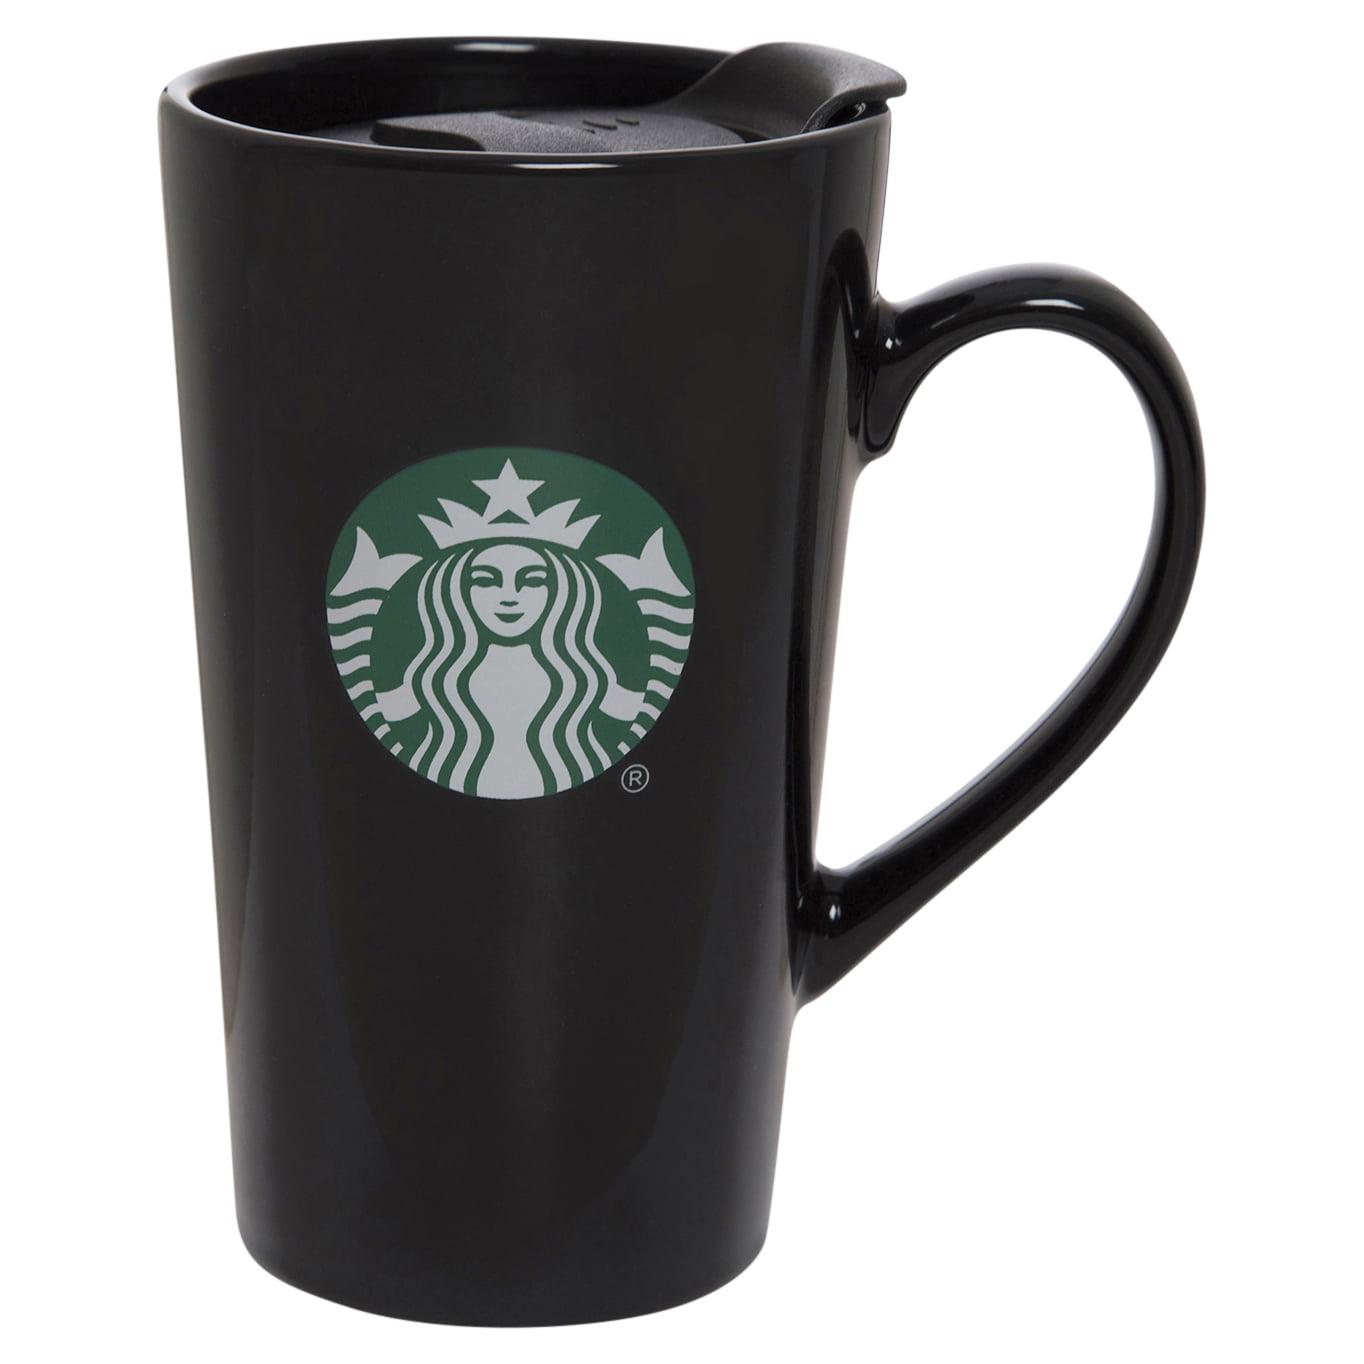 Starbucks 14oz Ceramic Latte Mug Black